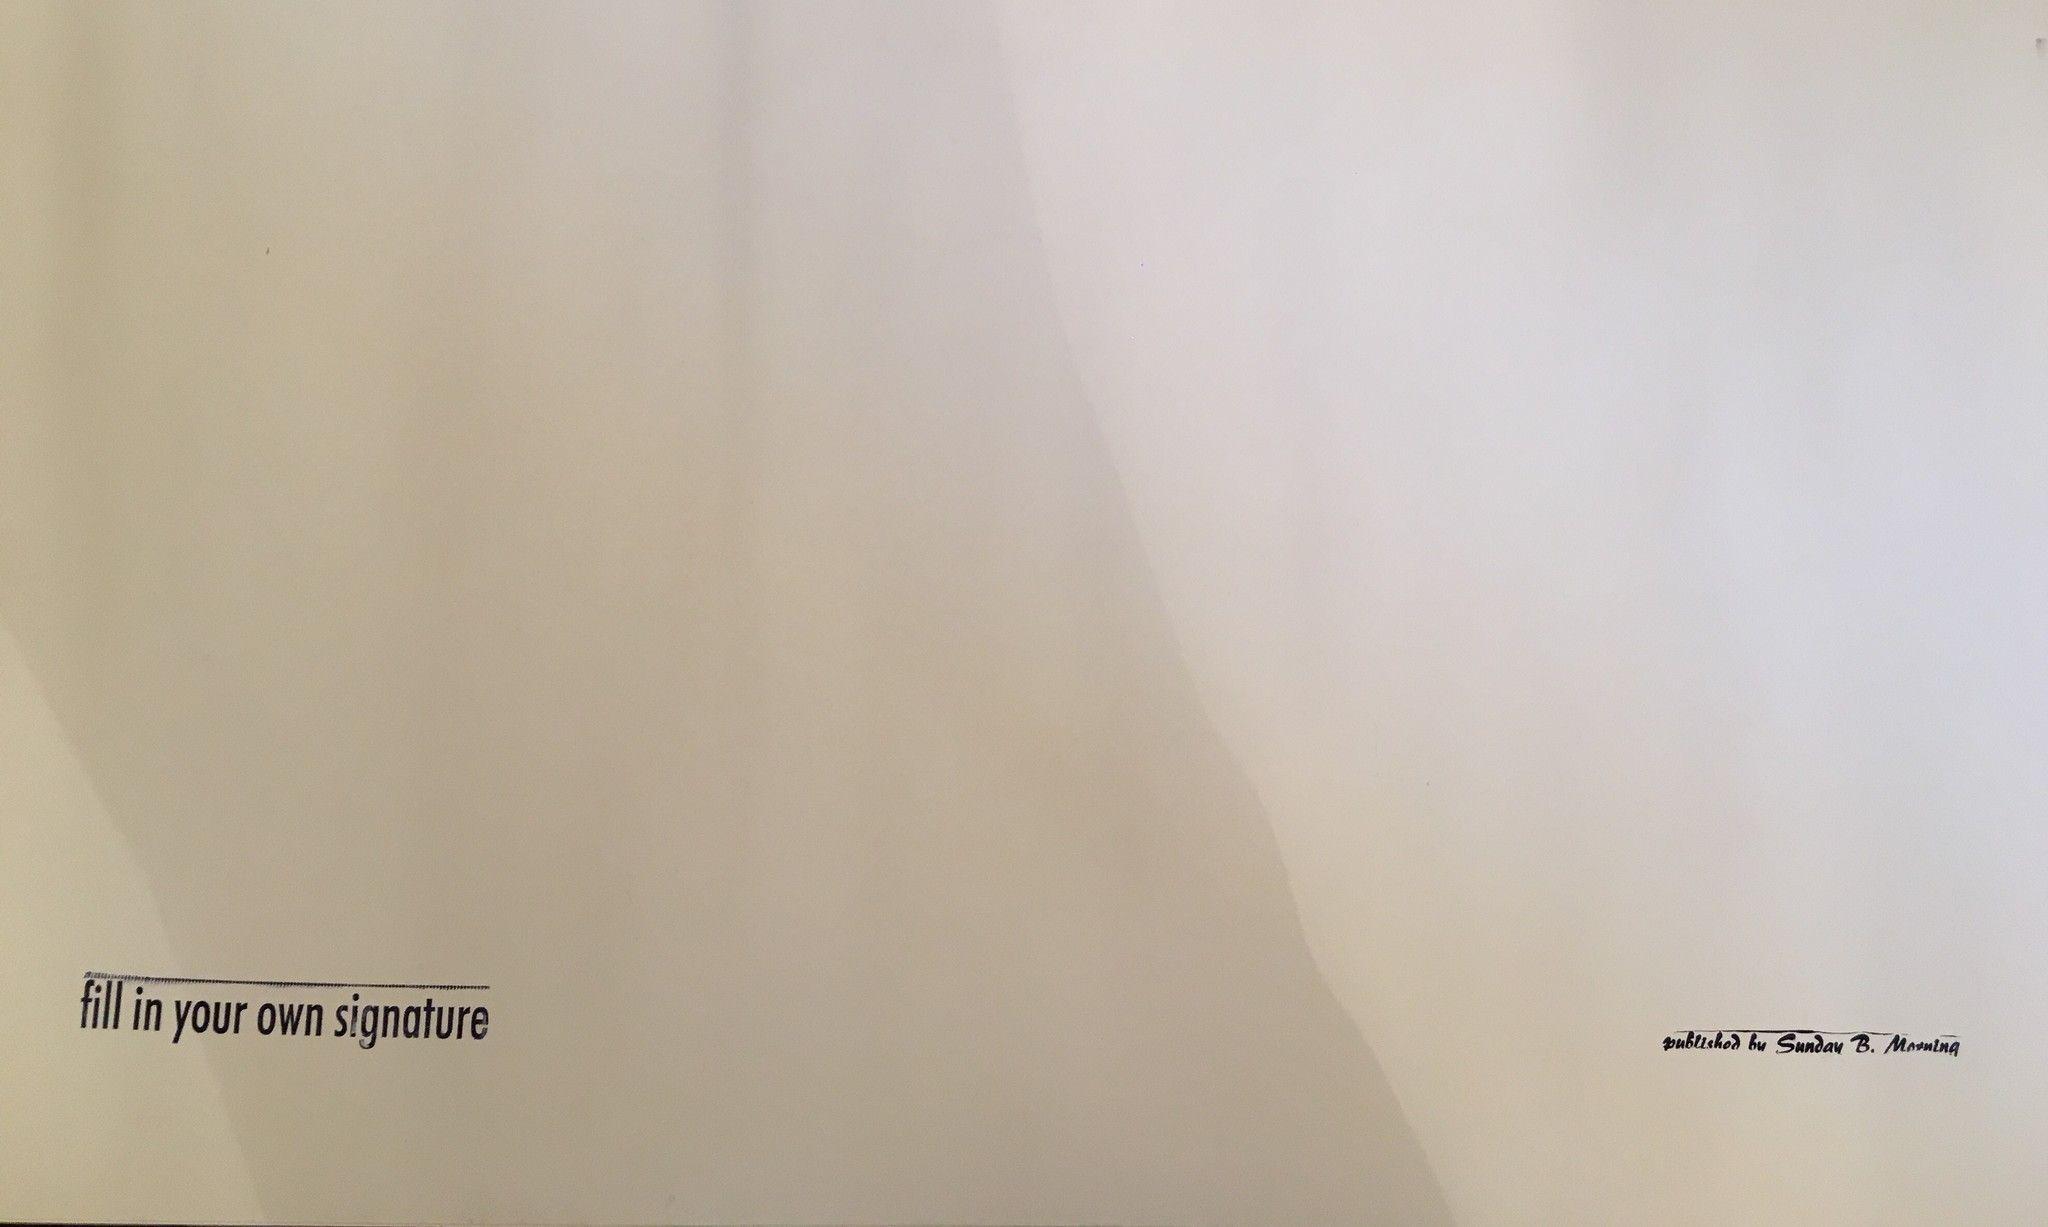 SERIGRAFIA ANDY WARHOL ' MARILYN 2 '  dimensioni L 91,5 x H 91,5 cm.